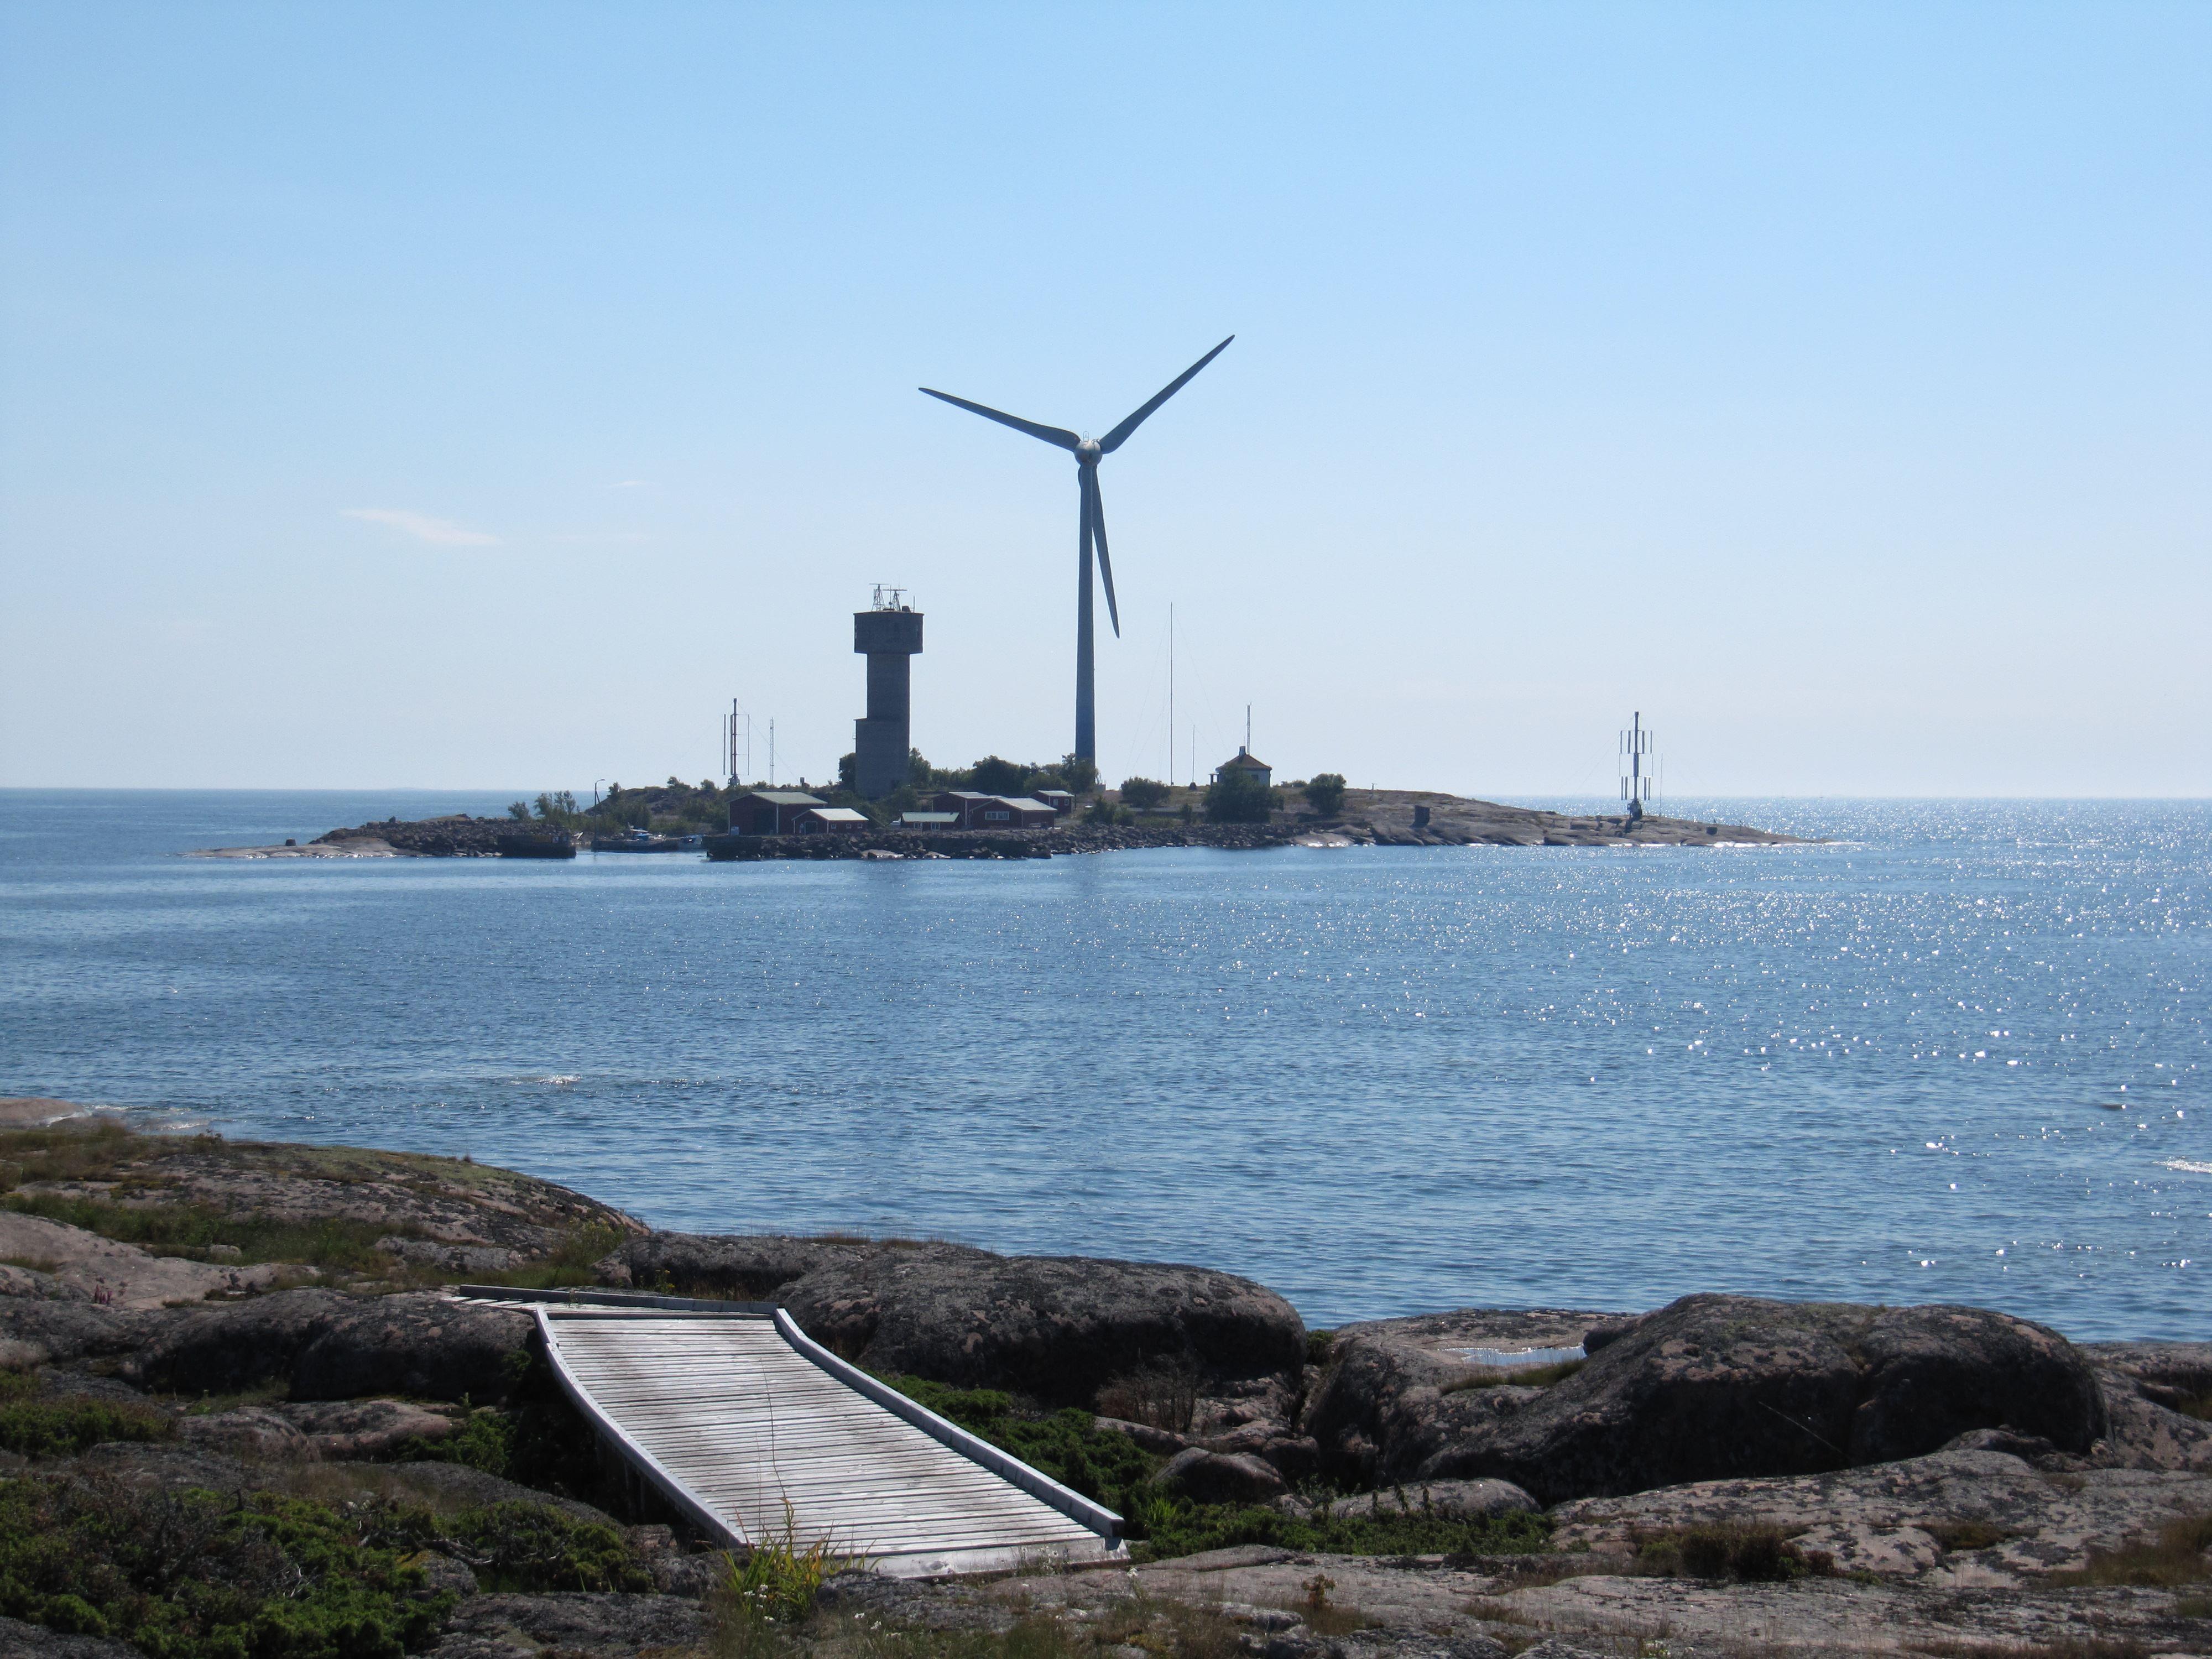 Shipland